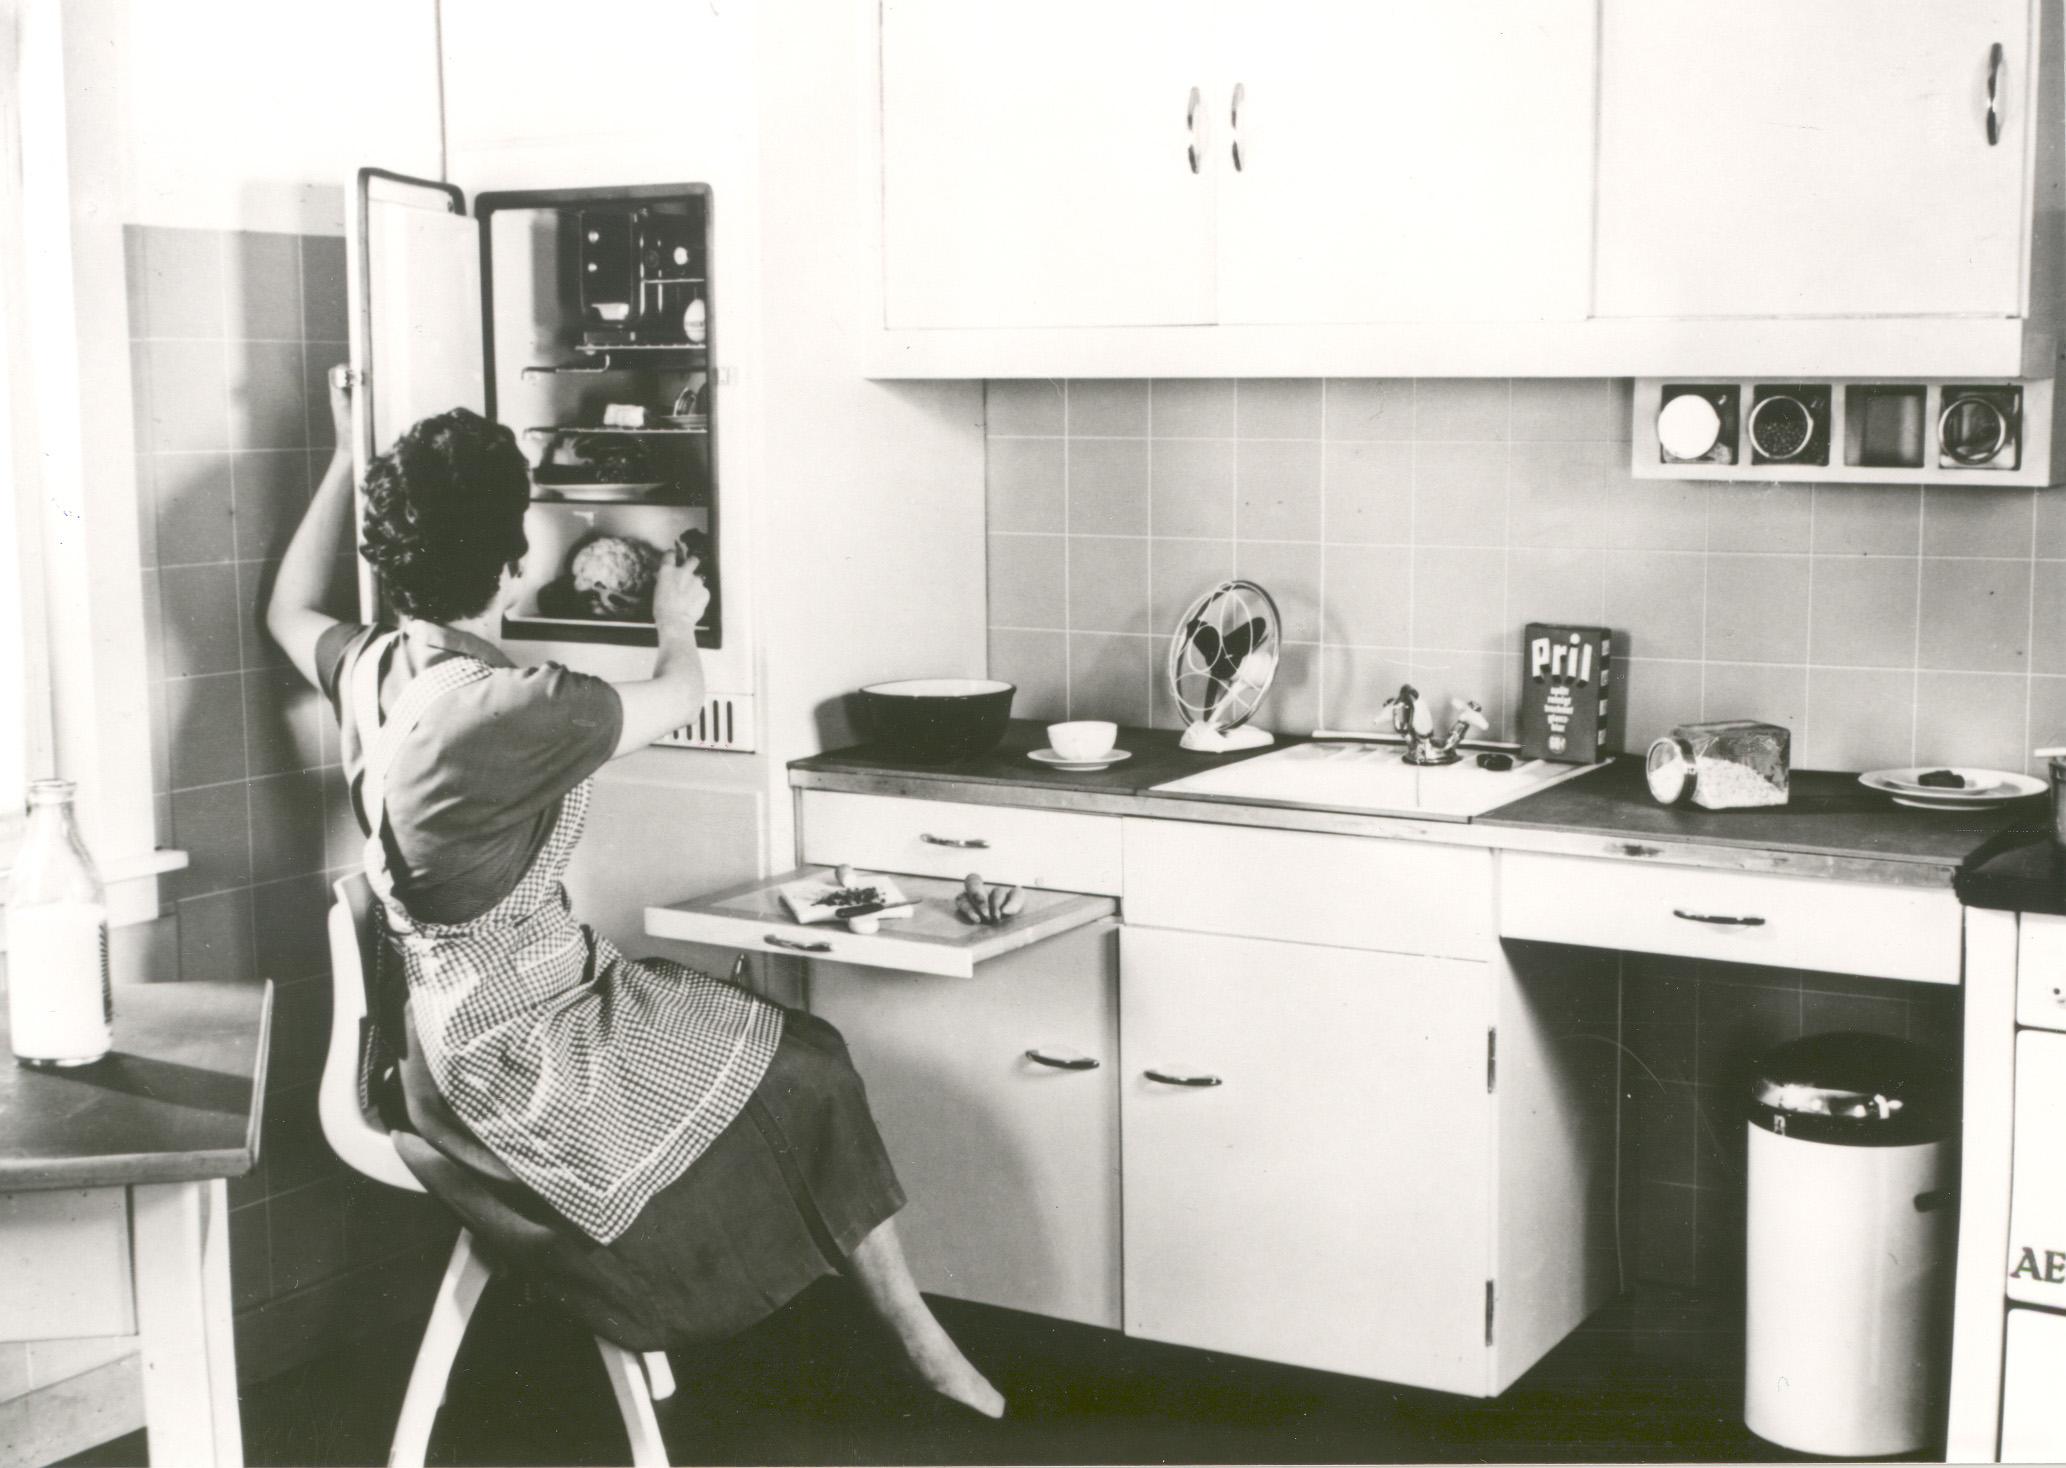 Amk image database amk arbeitsgemeinschaft die moderne küche e v